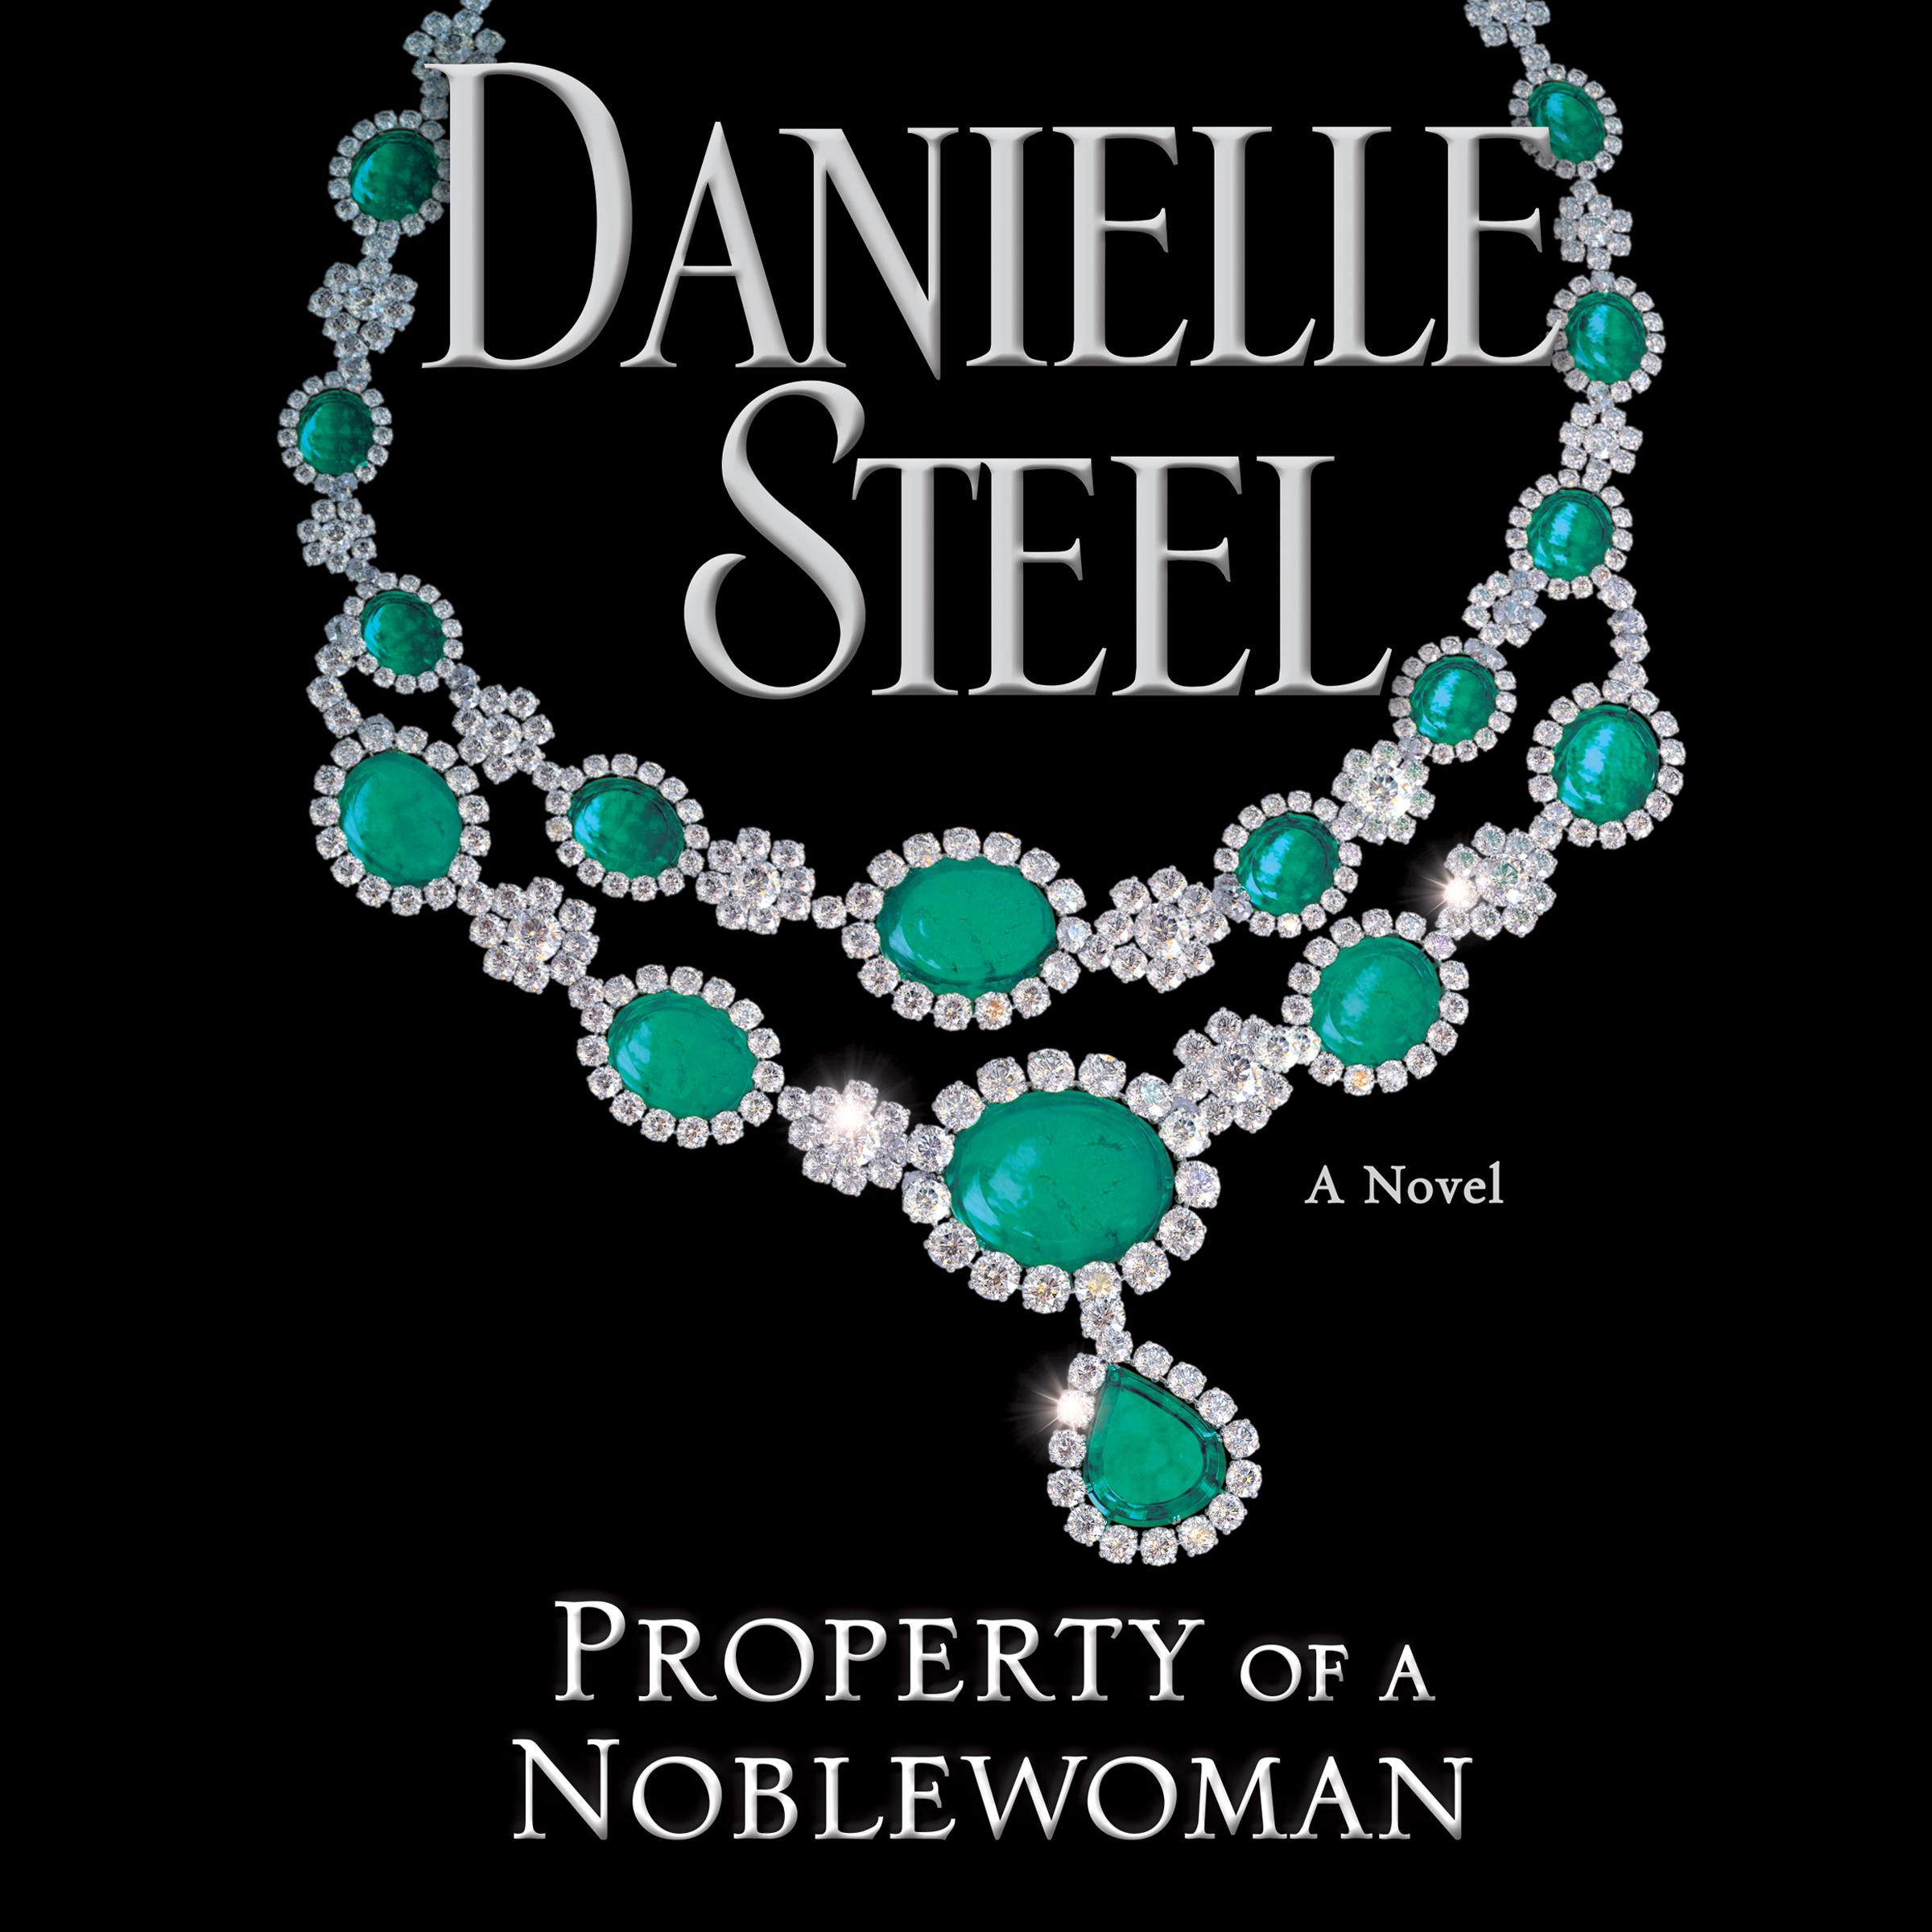 property-of-a-noblewoman-by-danielle-steel-romance-novels